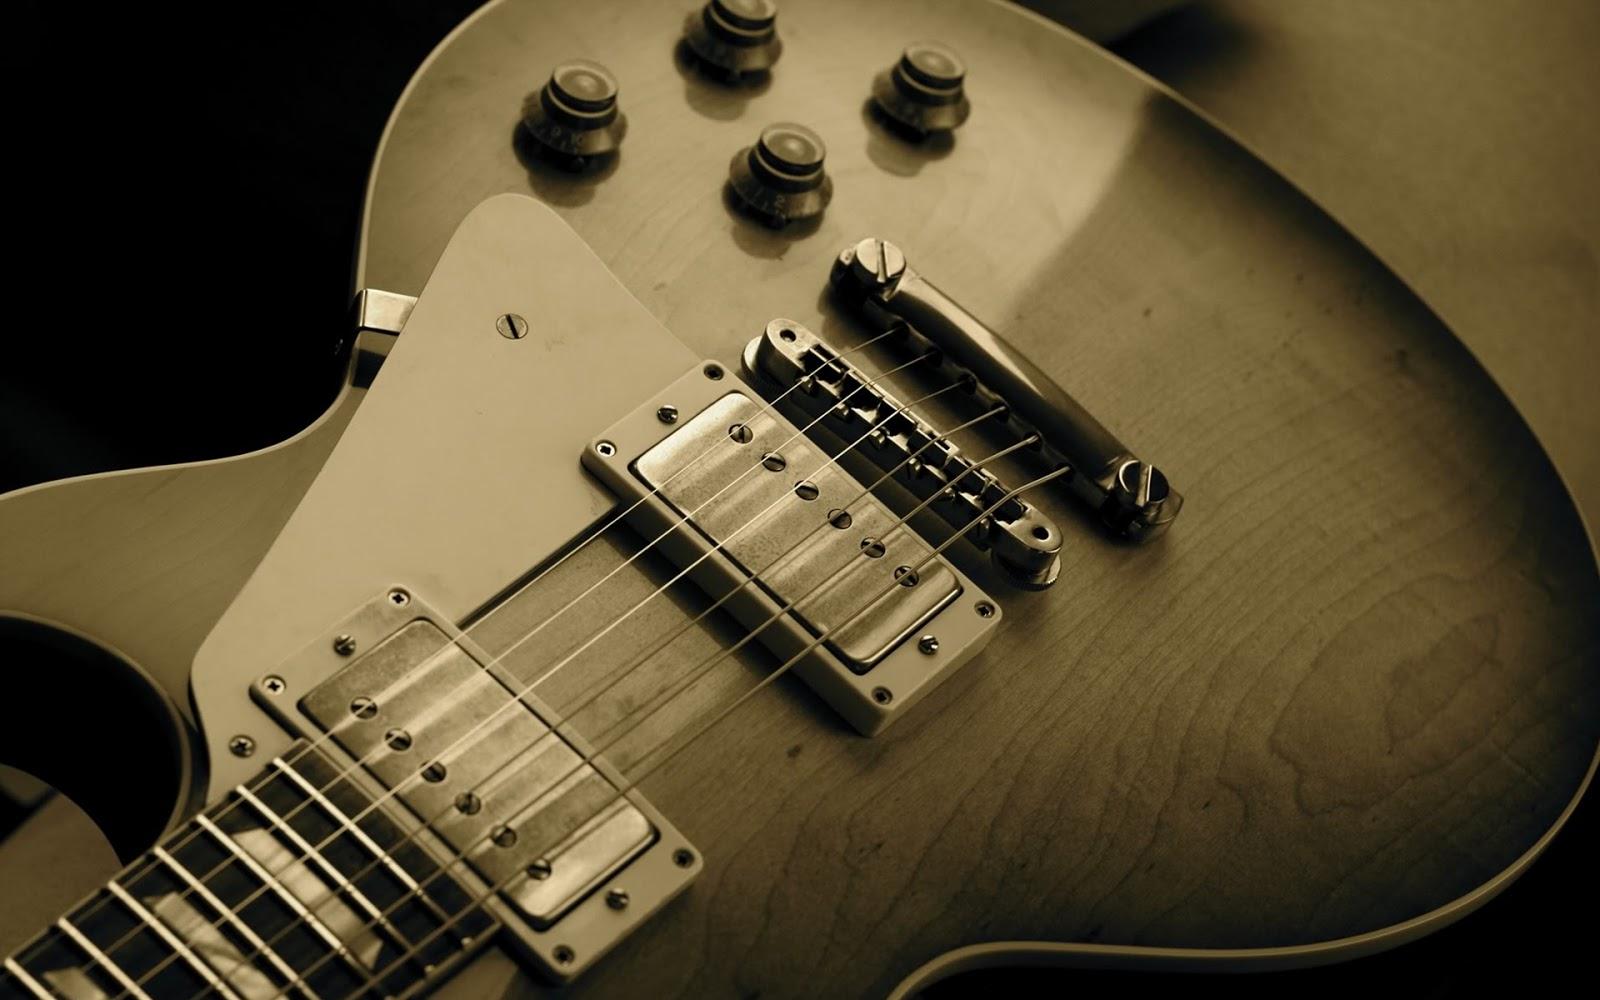 guitar wallpaper widescreen - photo #40